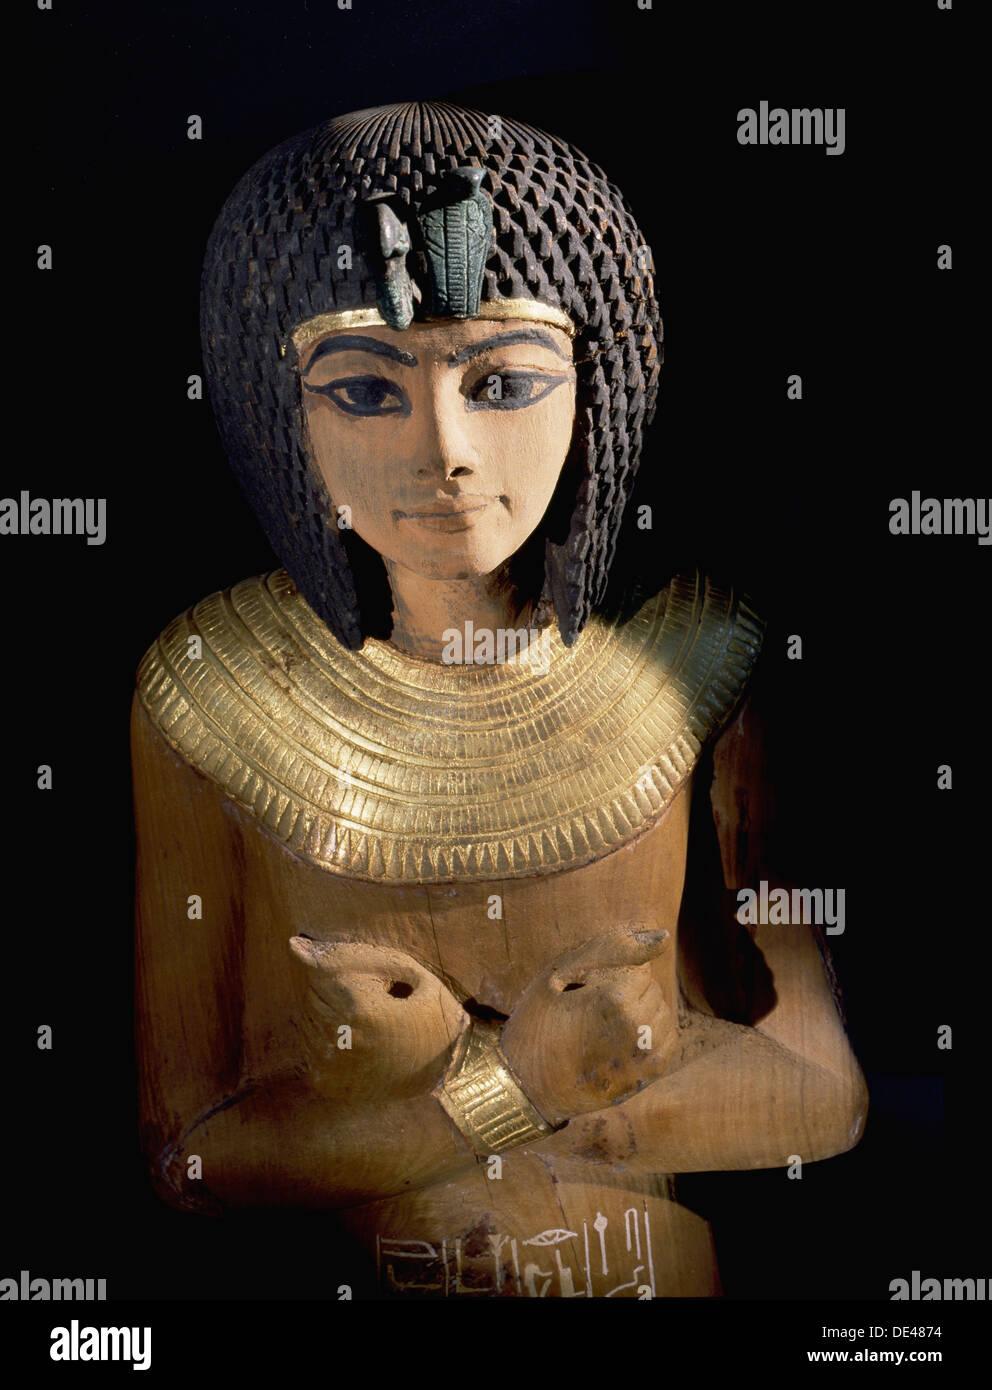 One of the many shabti from the tomb of Tutankhamun. - Stock Image